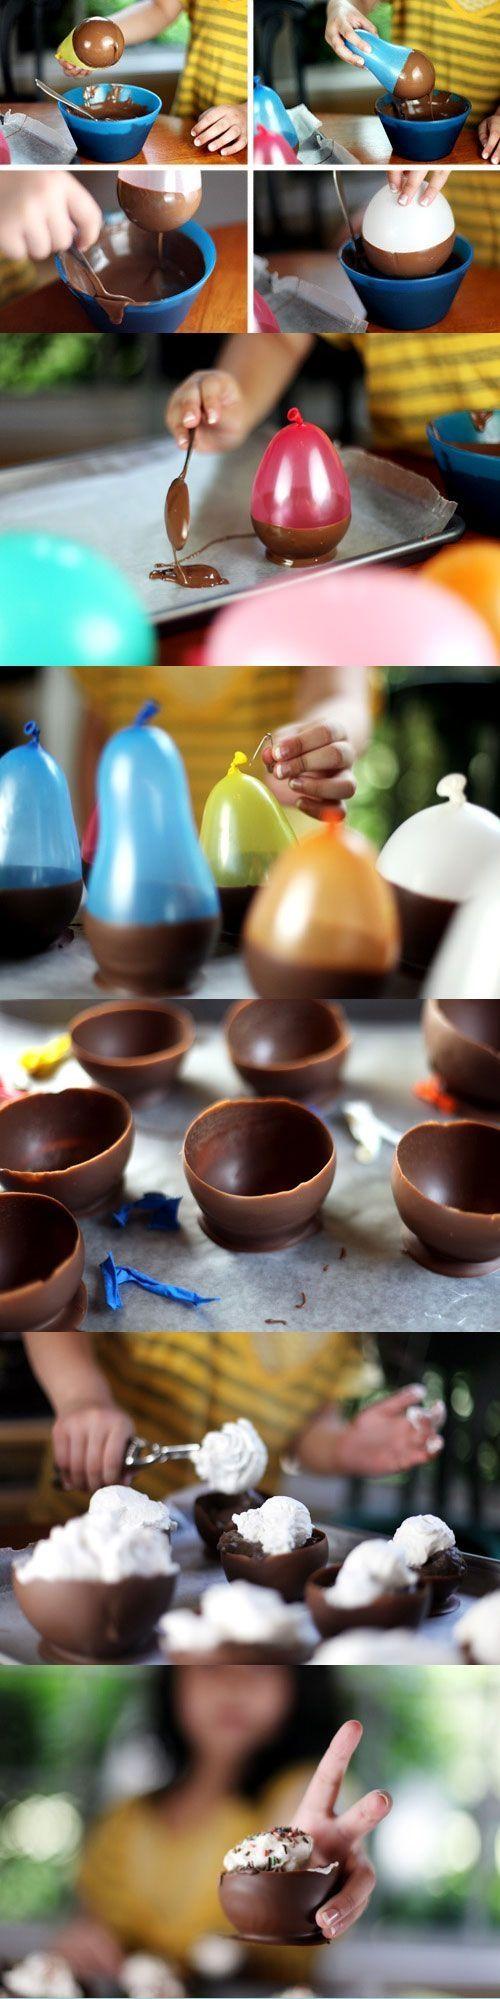 Supersimpele chocoladebakjes